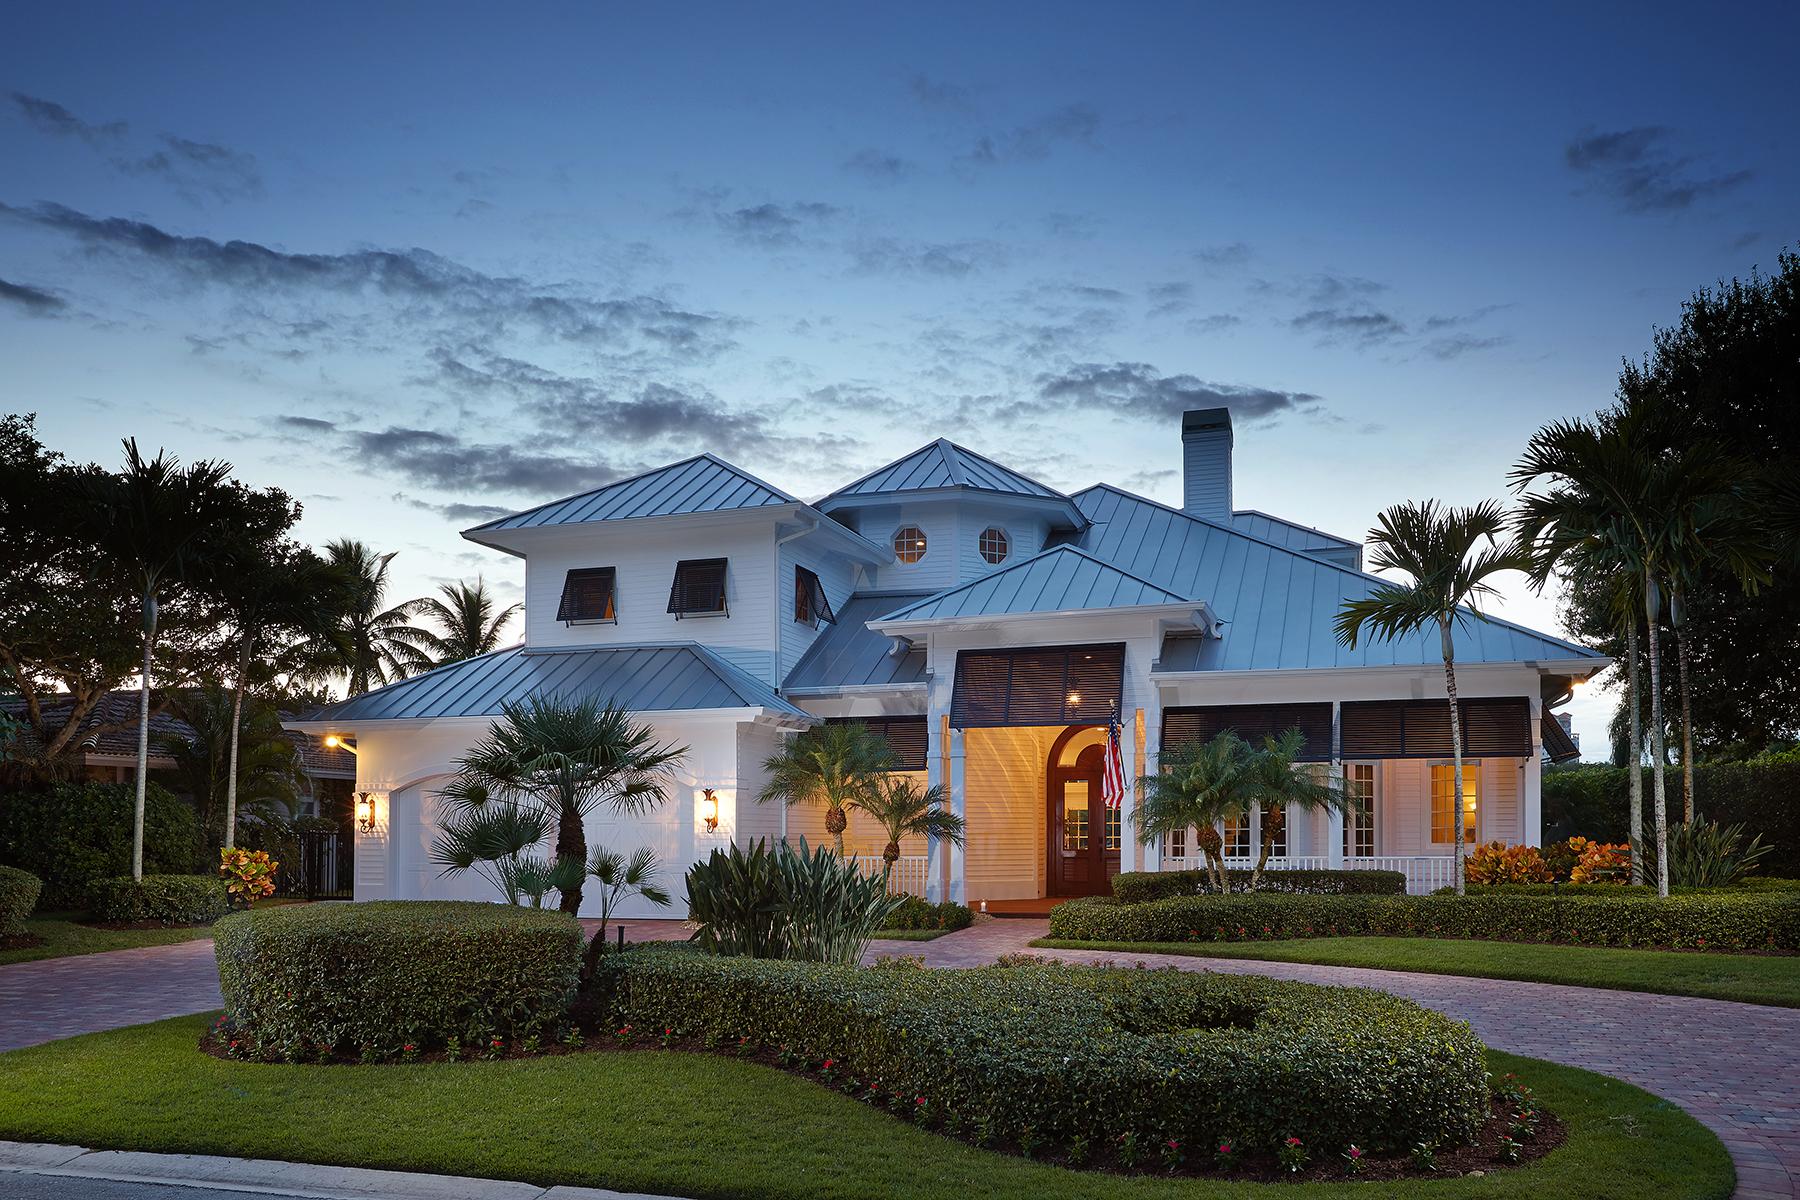 Villa per Vendita alle ore PARK SHORE 4745 Whispering Pine Way Naples, Florida, 34103 Stati Uniti